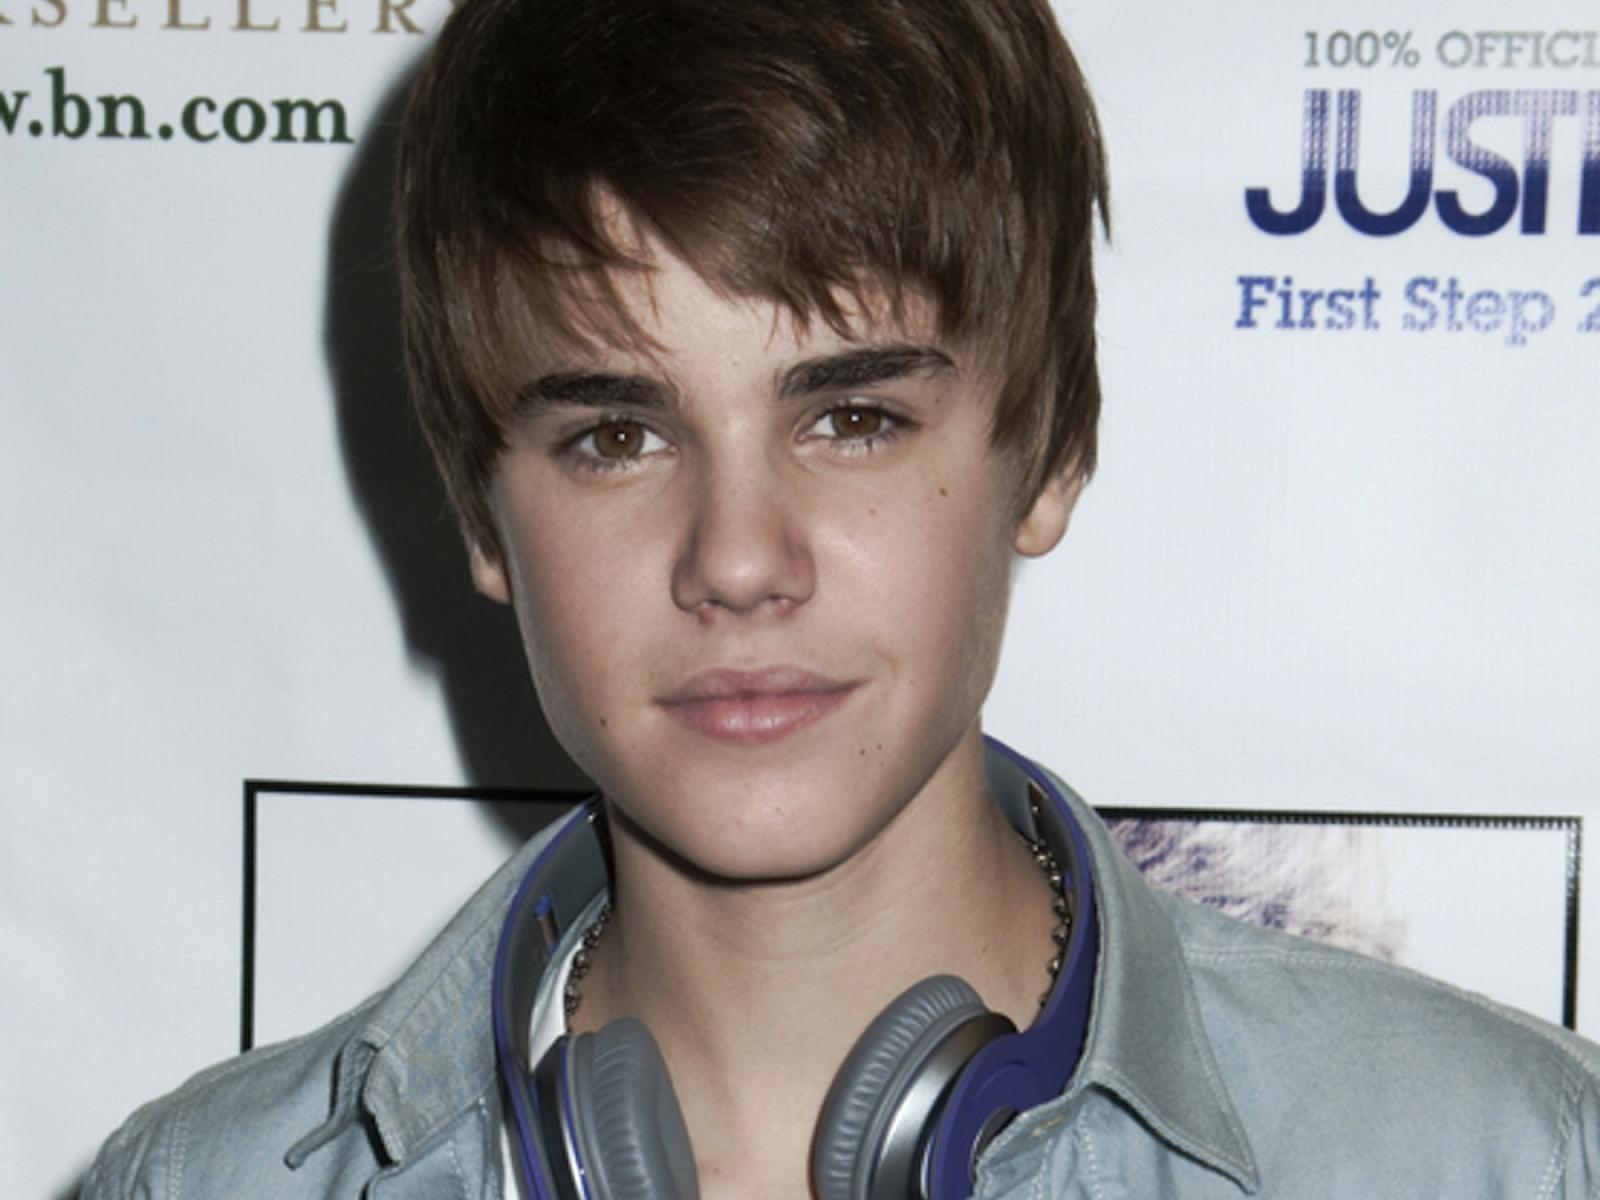 Justin Bieber 2011